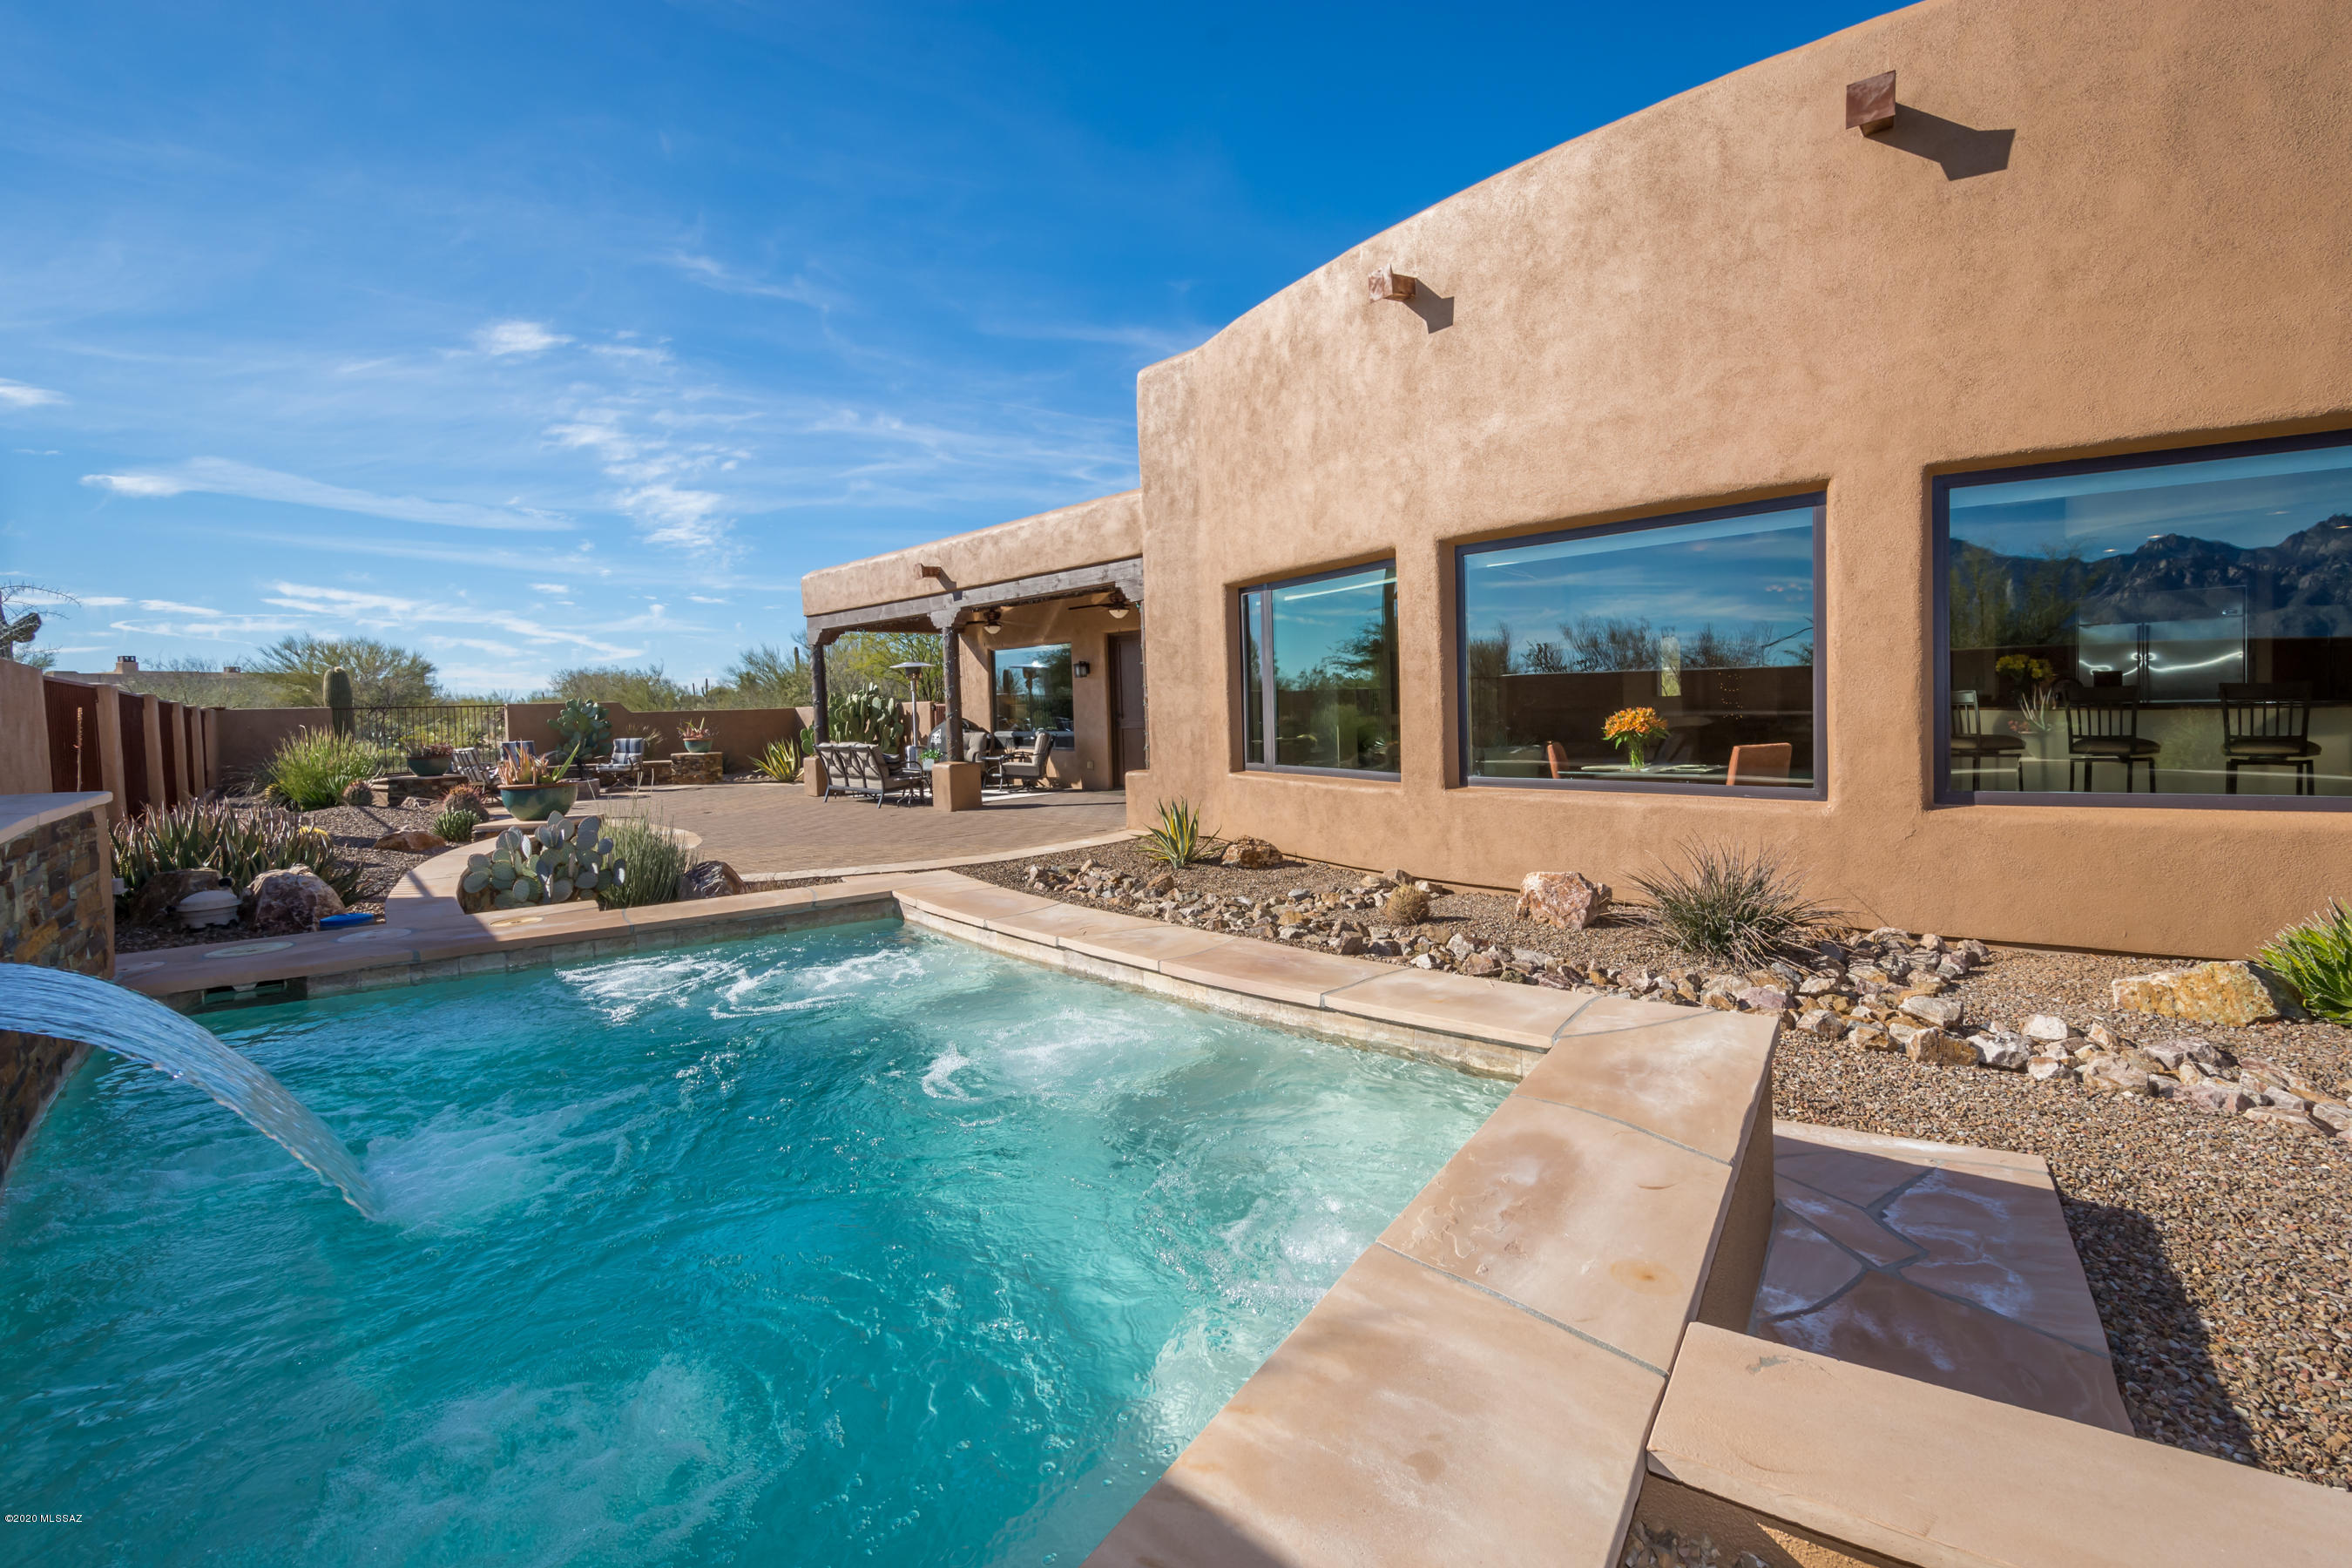 Photo of 14098 N Silver Cloud Drive, Oro Valley, AZ 85755